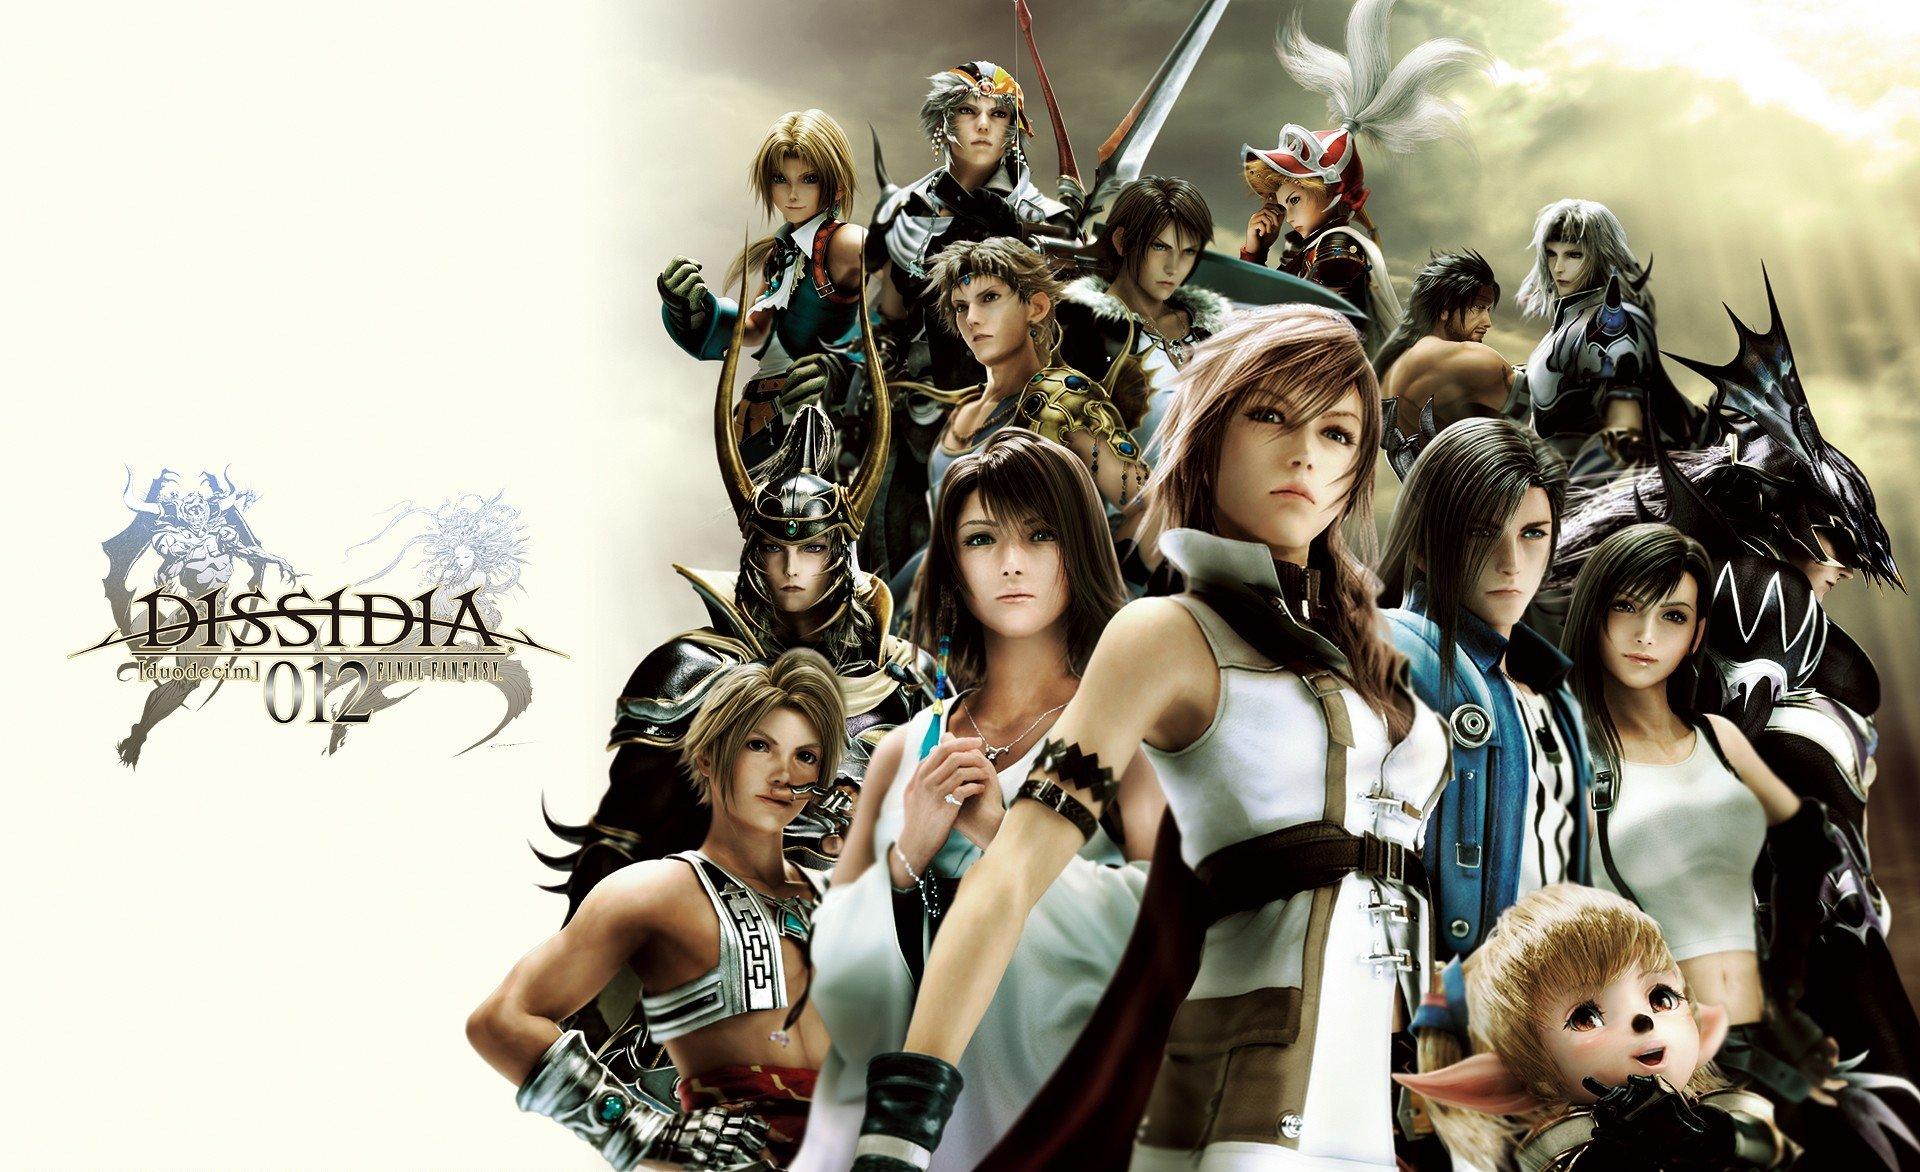 Final Fantasy X Yuna HD Wallpaper